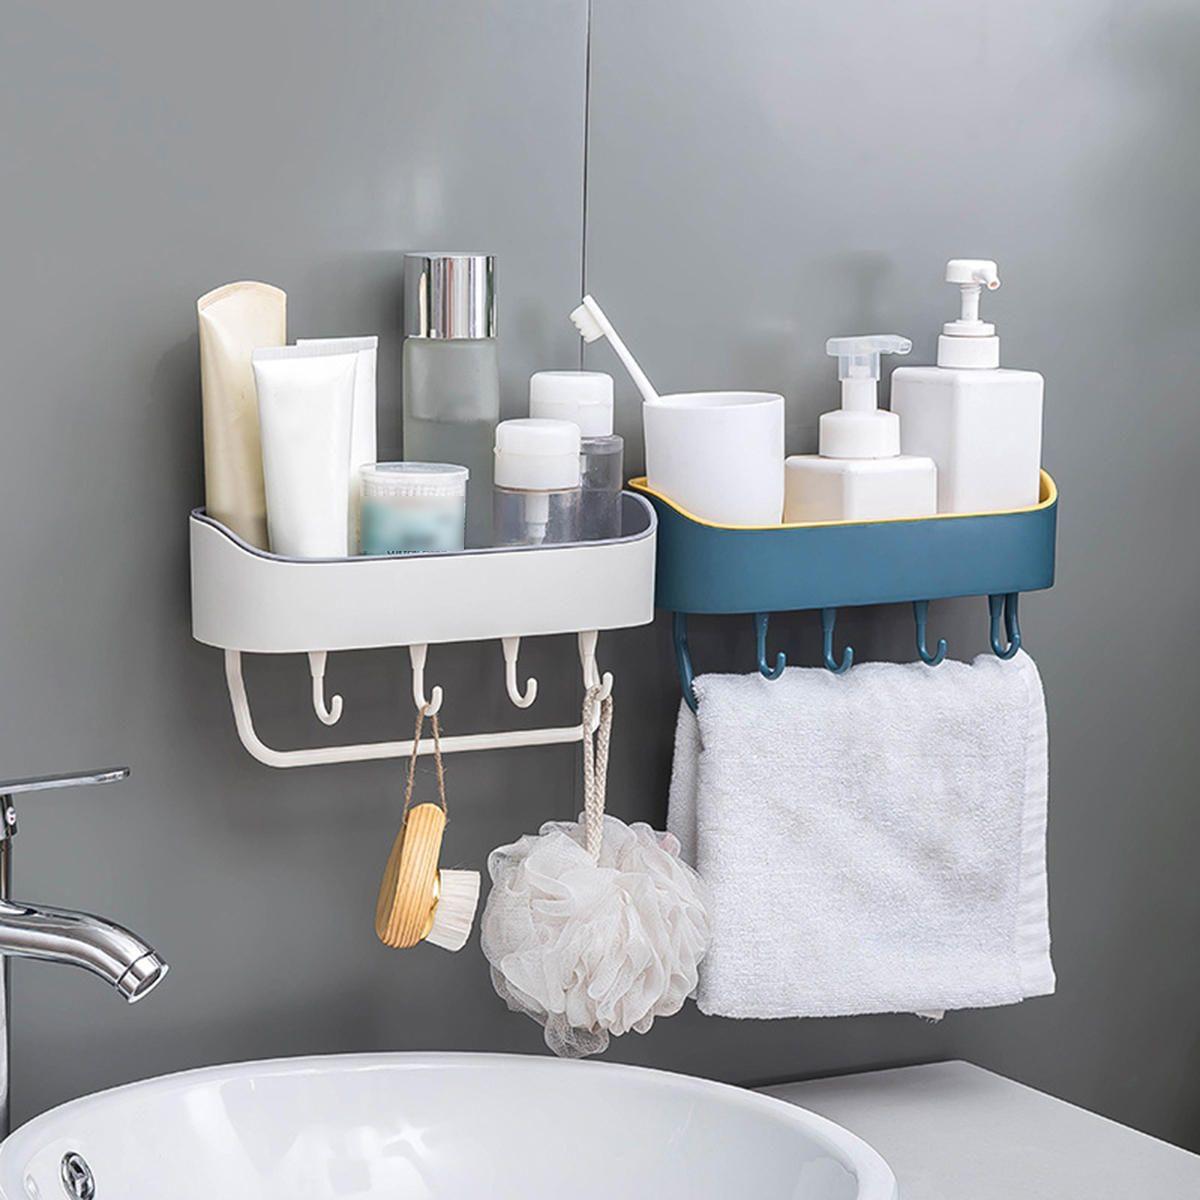 Us 11 99 25 Off No Drilling Shower Caddy With Self Adhesive Glue Hooks Storage Basket Bathroom Shelf Rack Wall Mounted Rack For Kitchen Bathroom Housekeepi Shower Shelves Plastic Storage Shelves Bathroom Shelves [ jpg ]